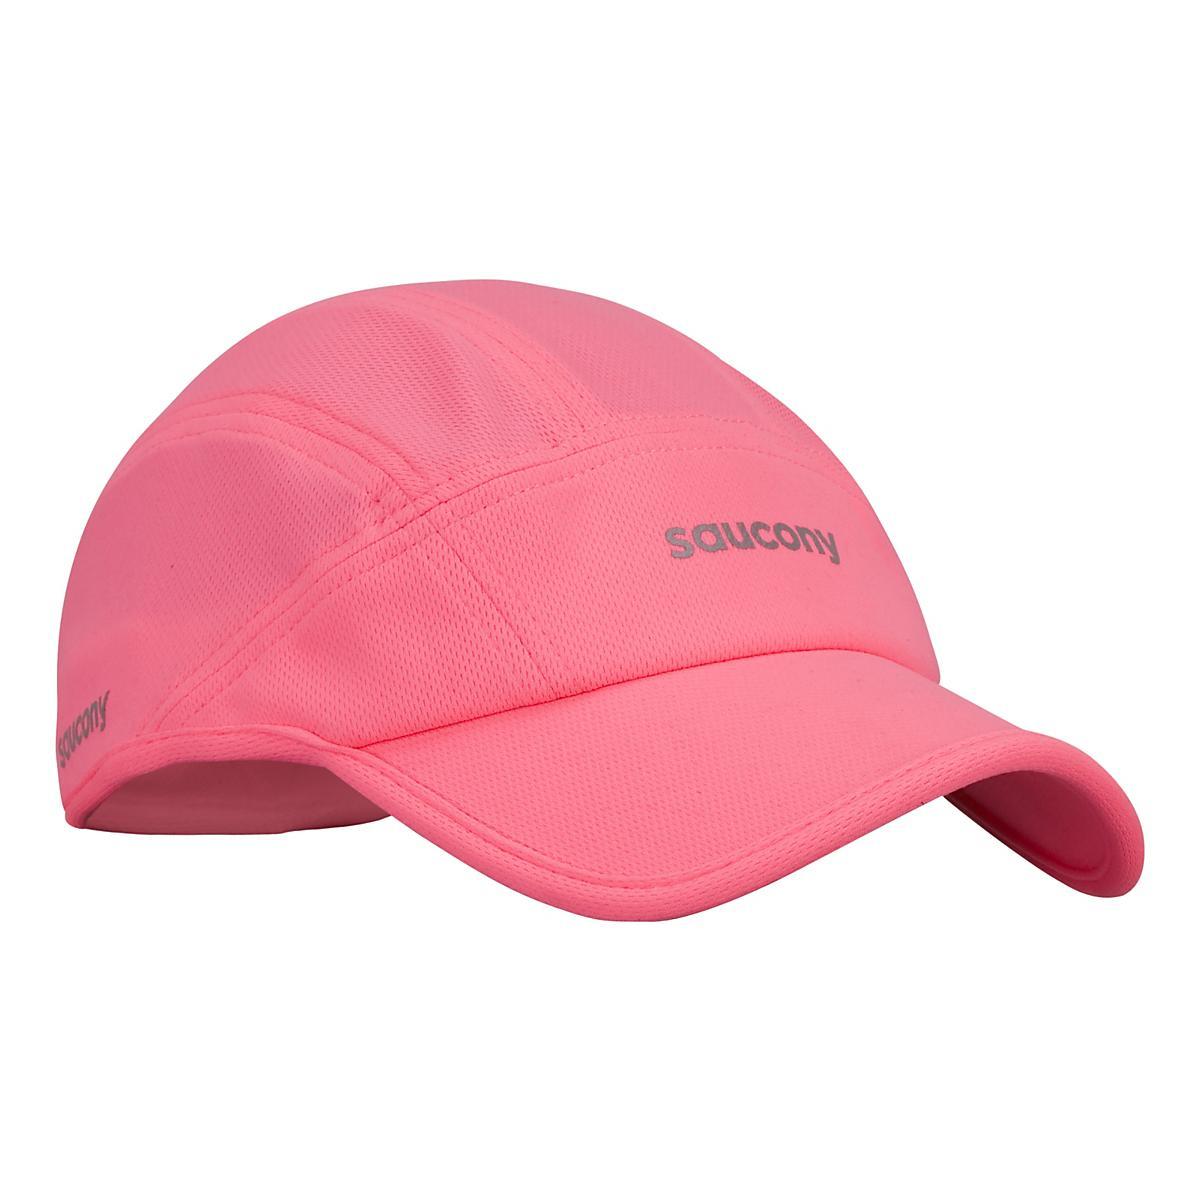 fb9a3464c5e Saucony Speed Run Hat Headwear at Road Runner Sports